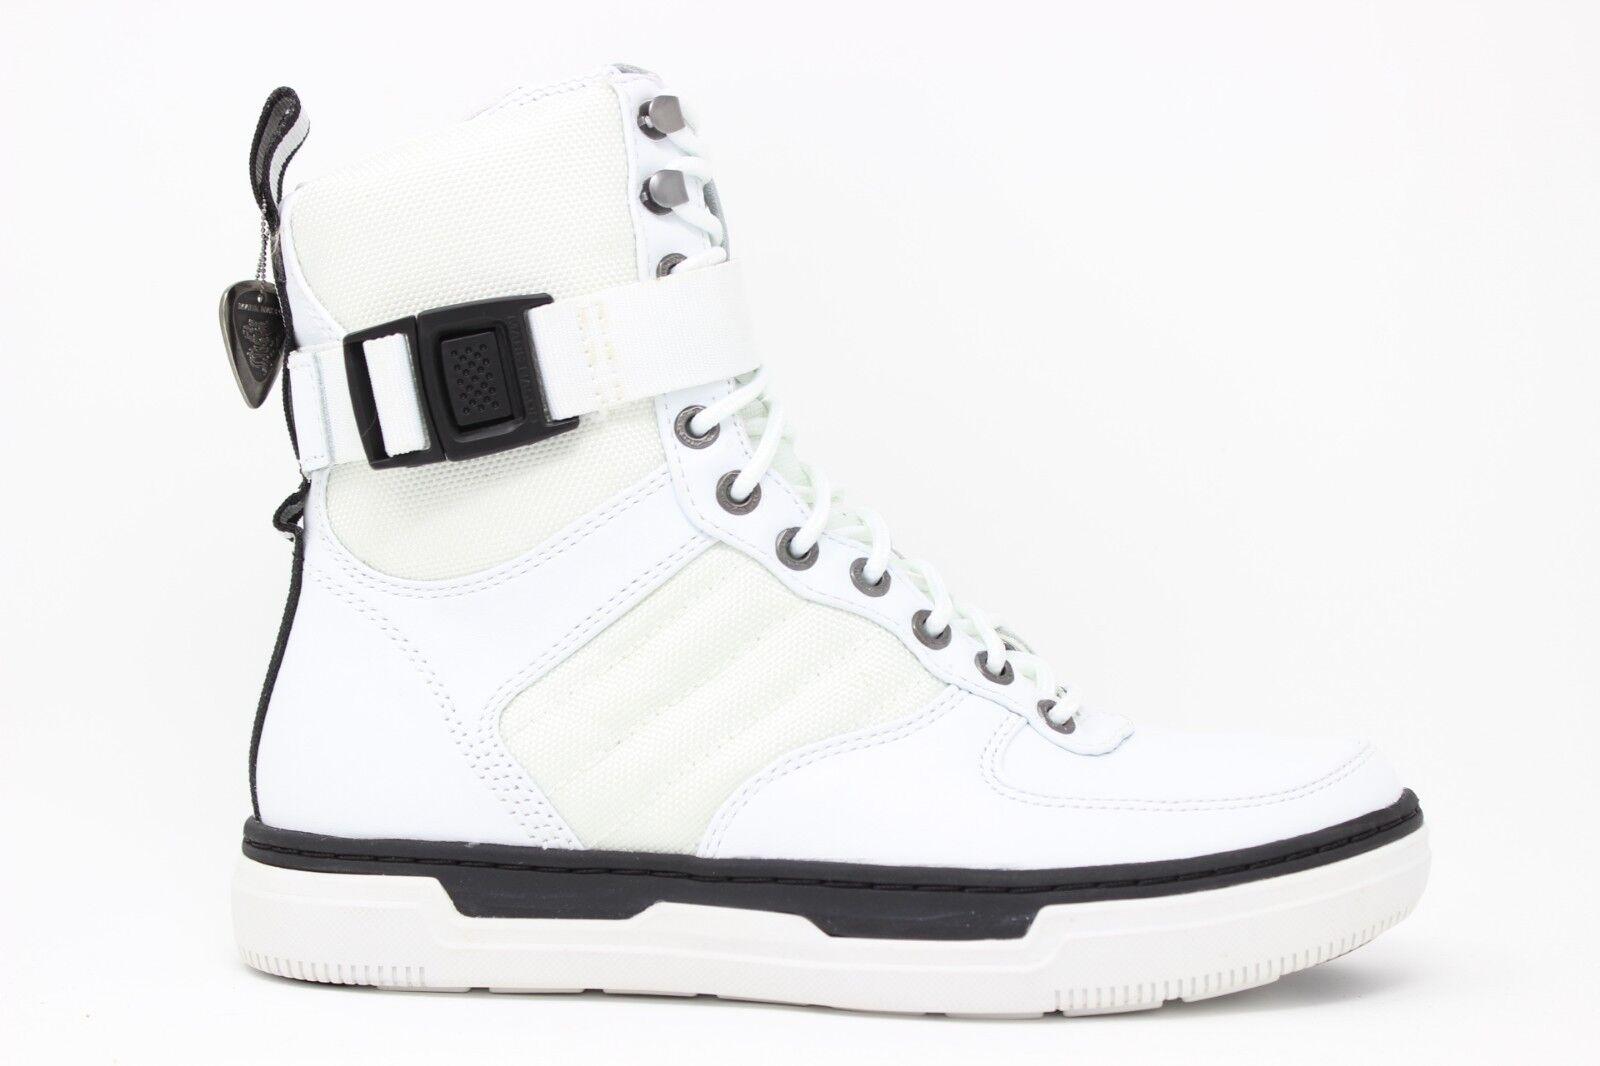 Skechers Men's Mark Nason SERGEANT 68594 WHT White Brand New In Box